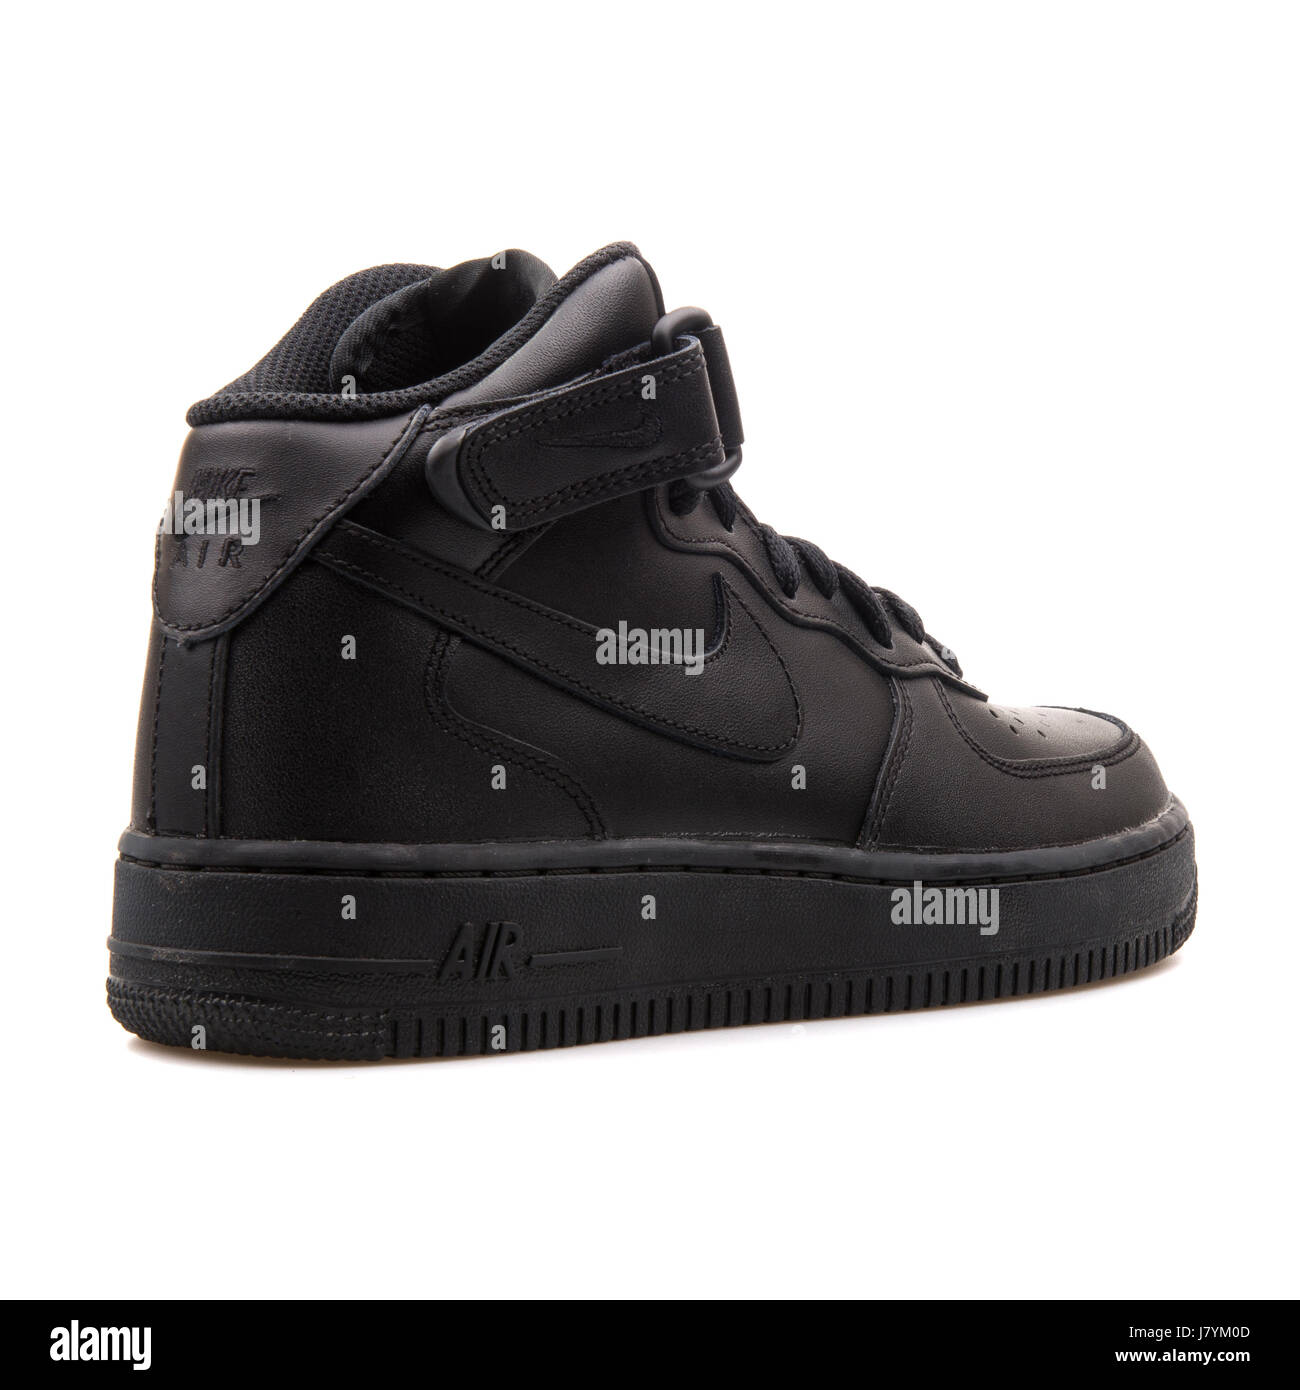 claro la carretera Bigote  Nike WMNS Air Force 1 Mid '07 LE Black Women's Sports Sneakers Stock Photo  - Alamy